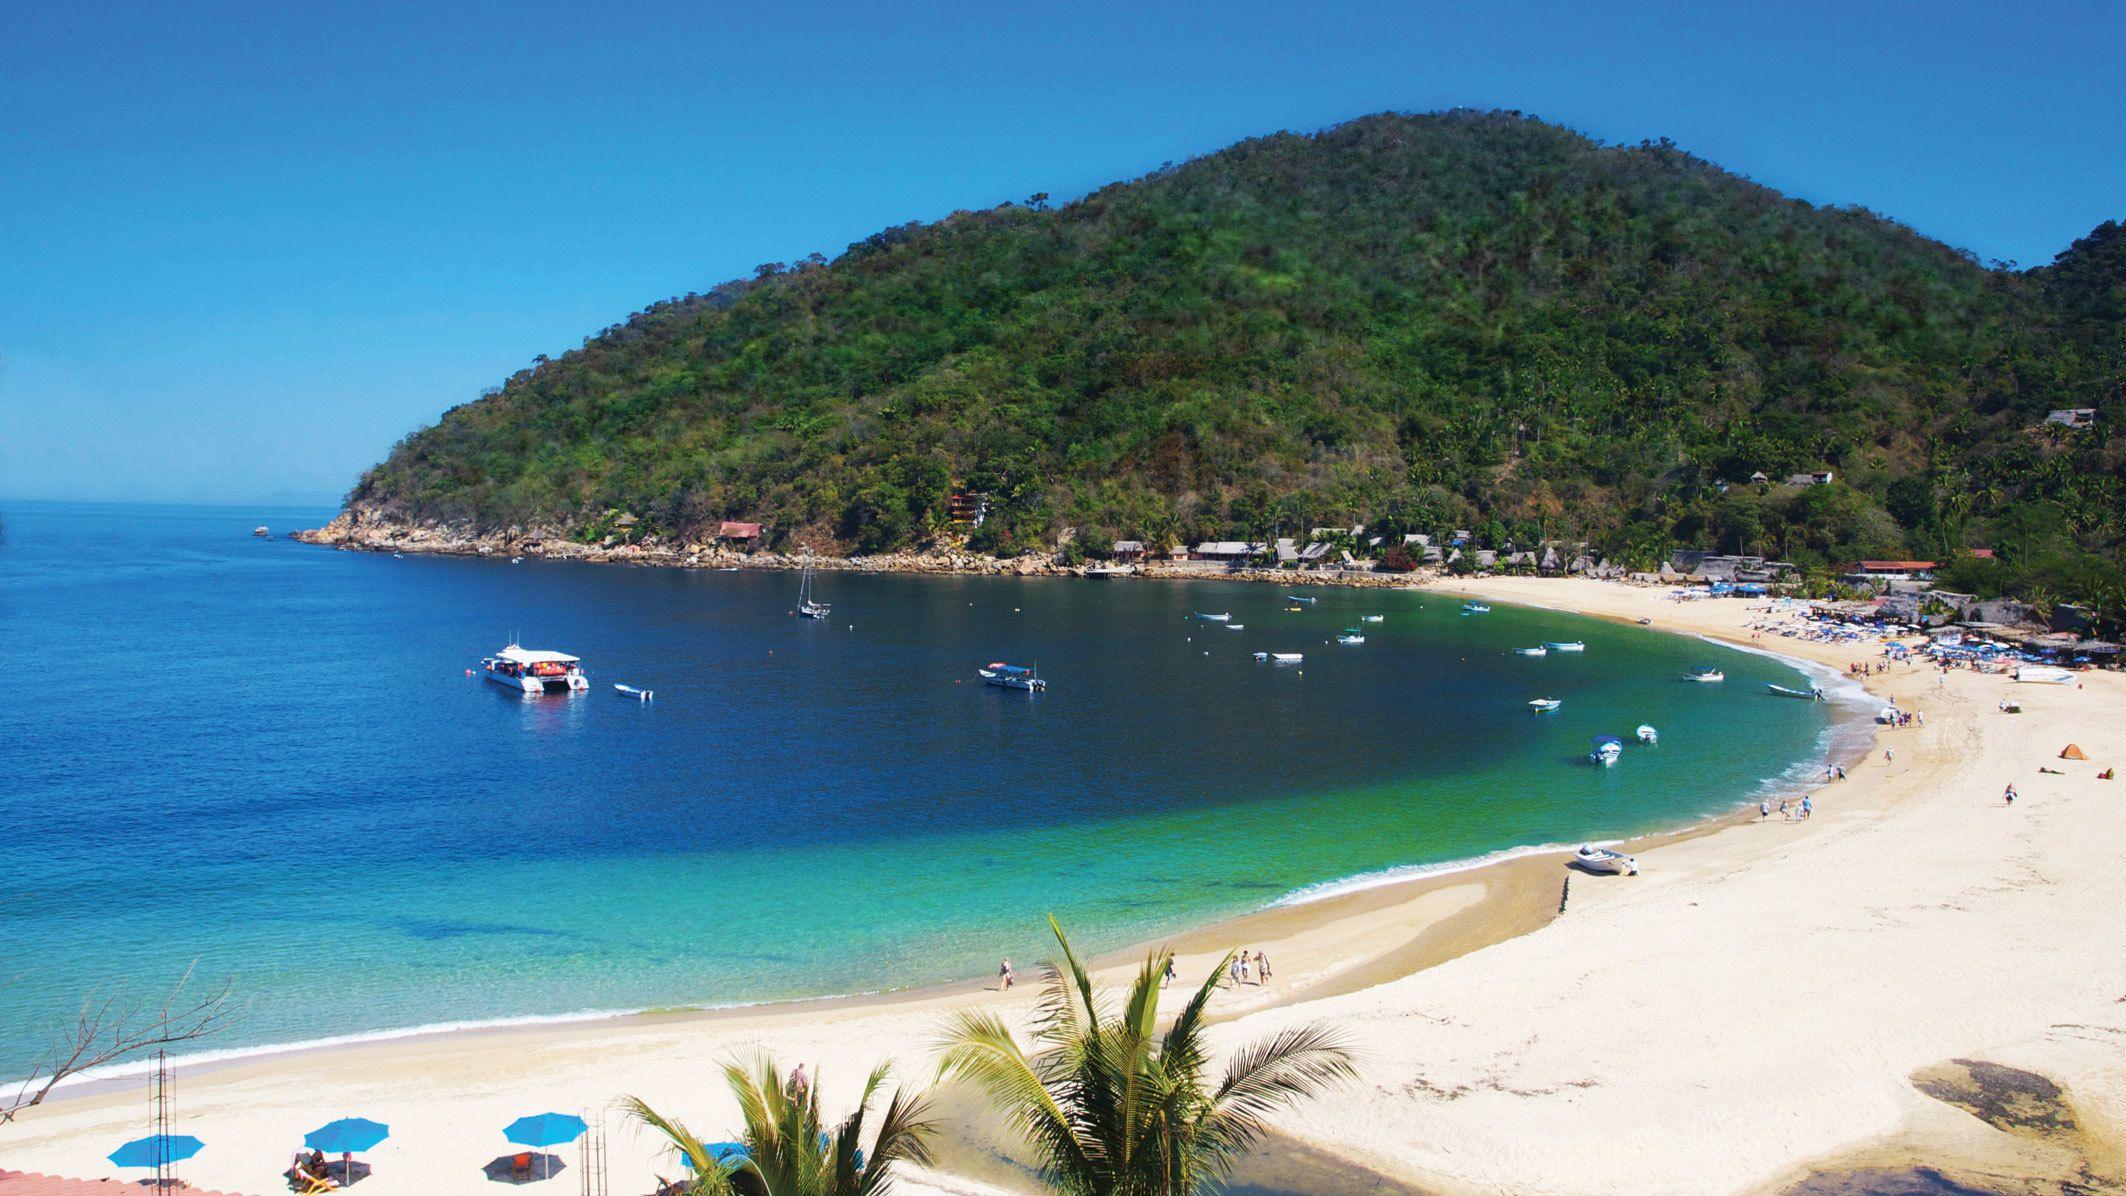 Yelapa & Majahuitas Catamaran Tour